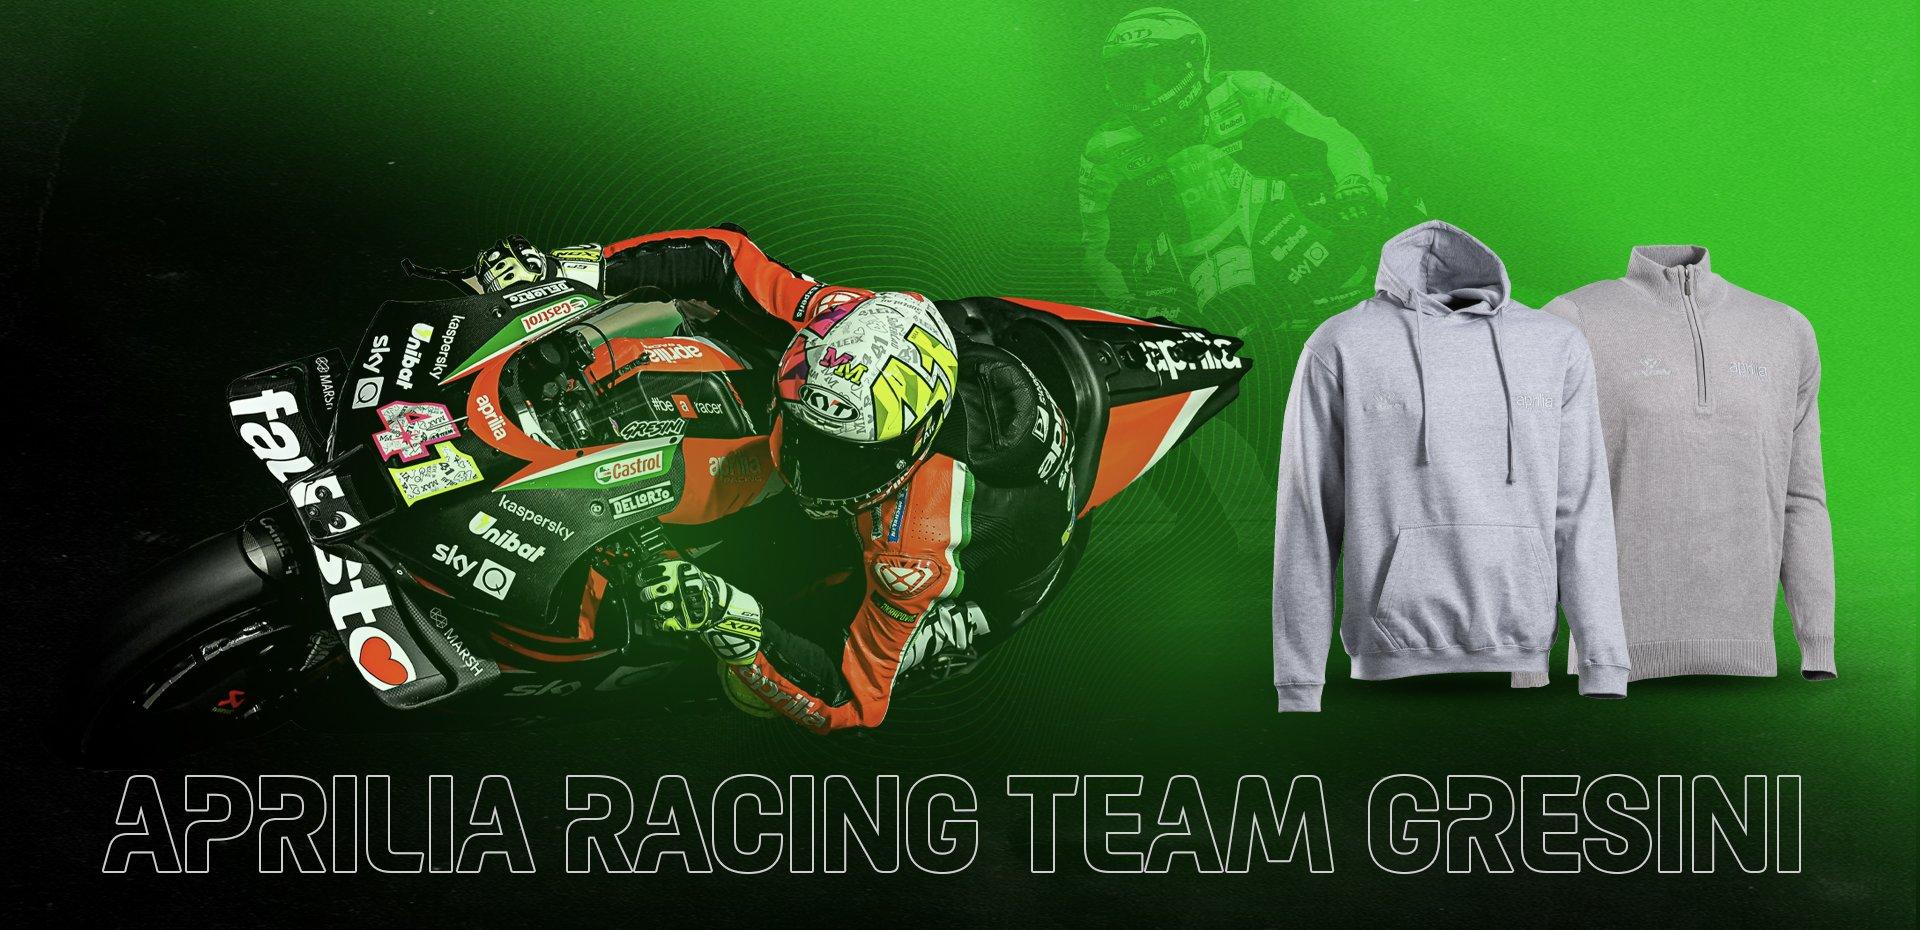 Nouvelle collection Aprilia Racing Team Gresini